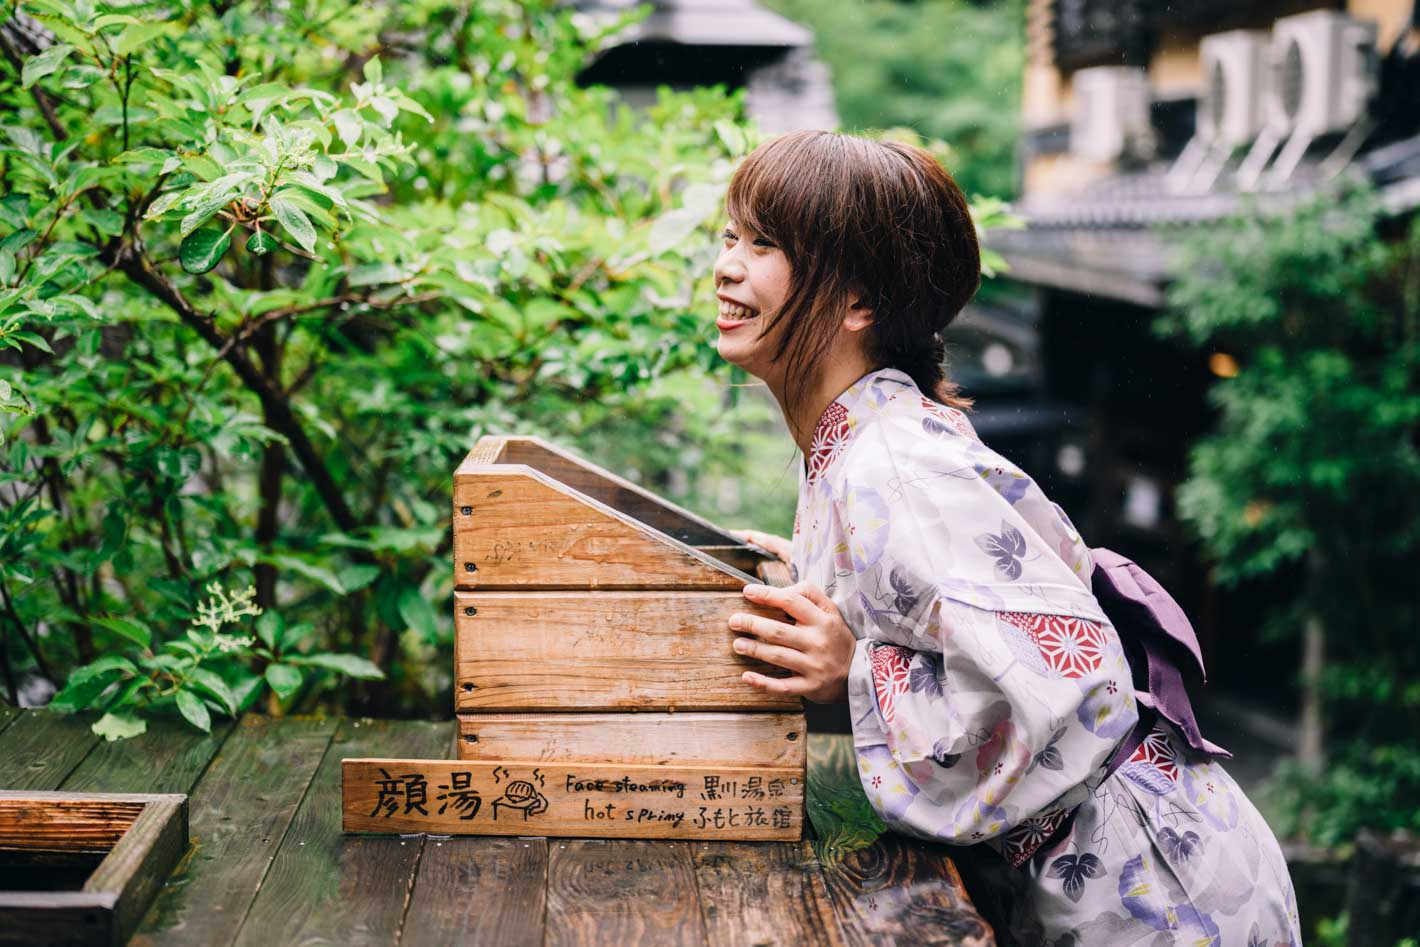 Z 7、NIKKOR Z 50mm f/1.8 S / photo by yasuka